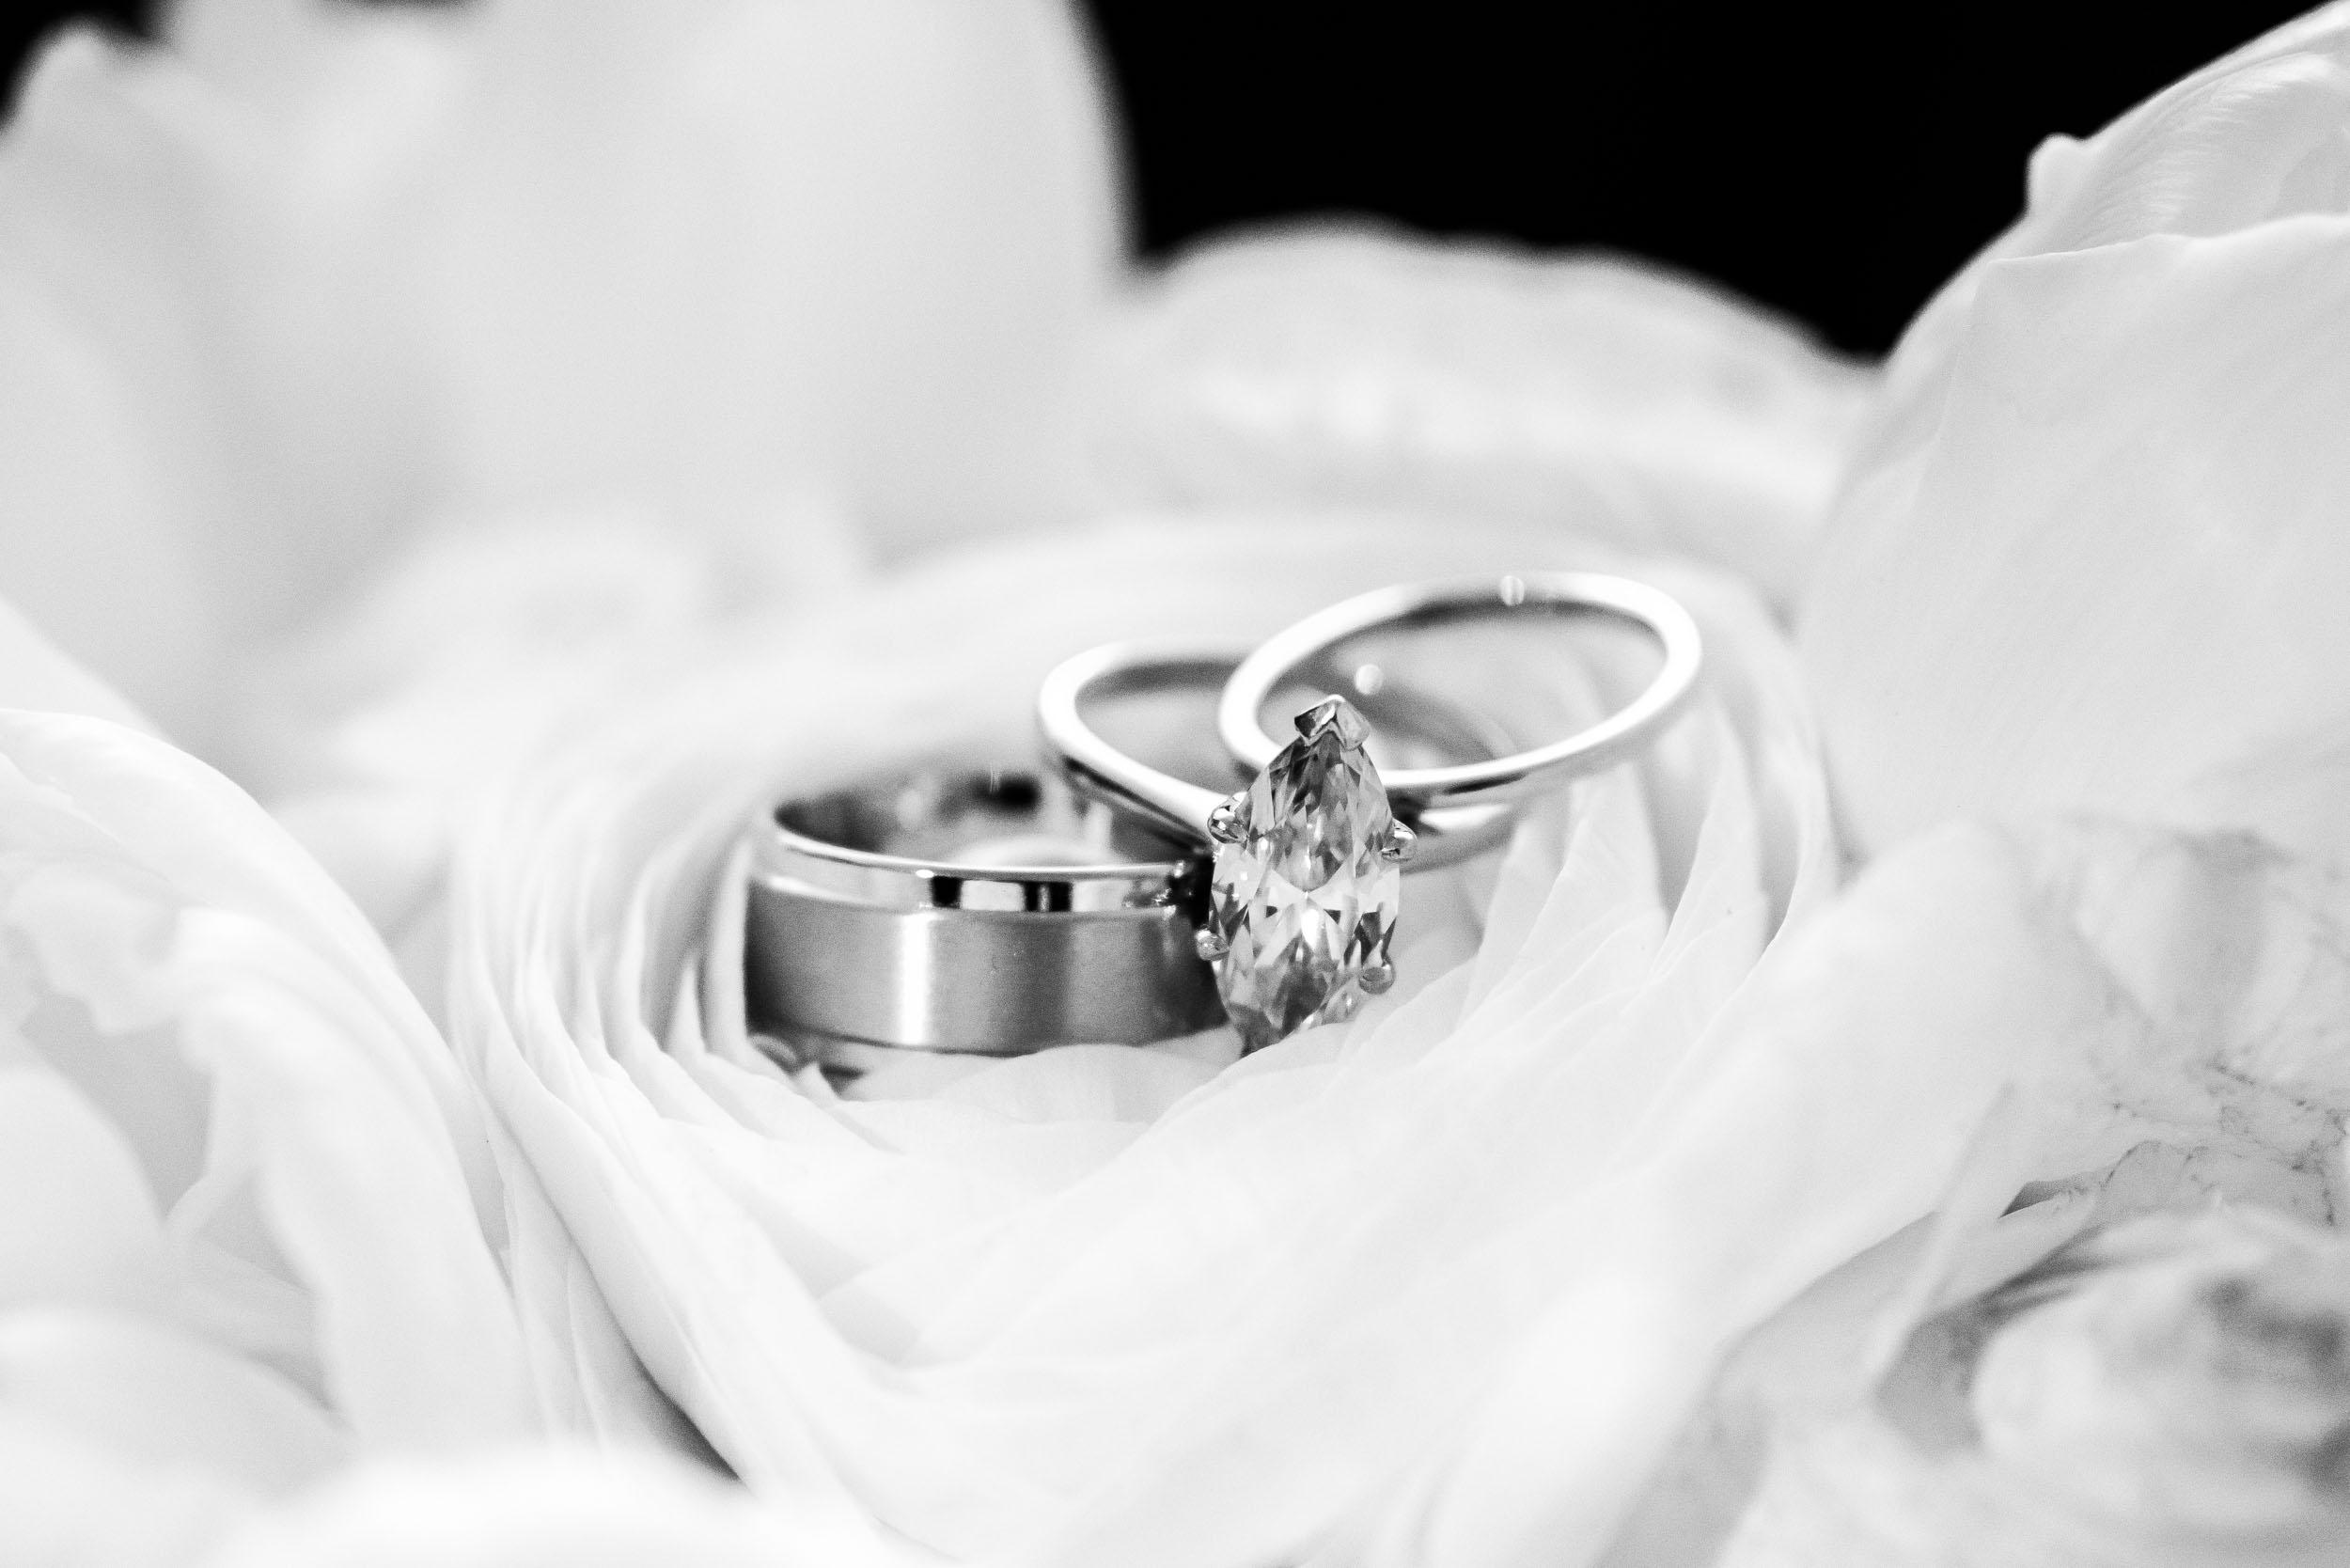 dc+metro+wedding+photographer+vadym+guliuk+photography+wedding+rings-2023.jpg